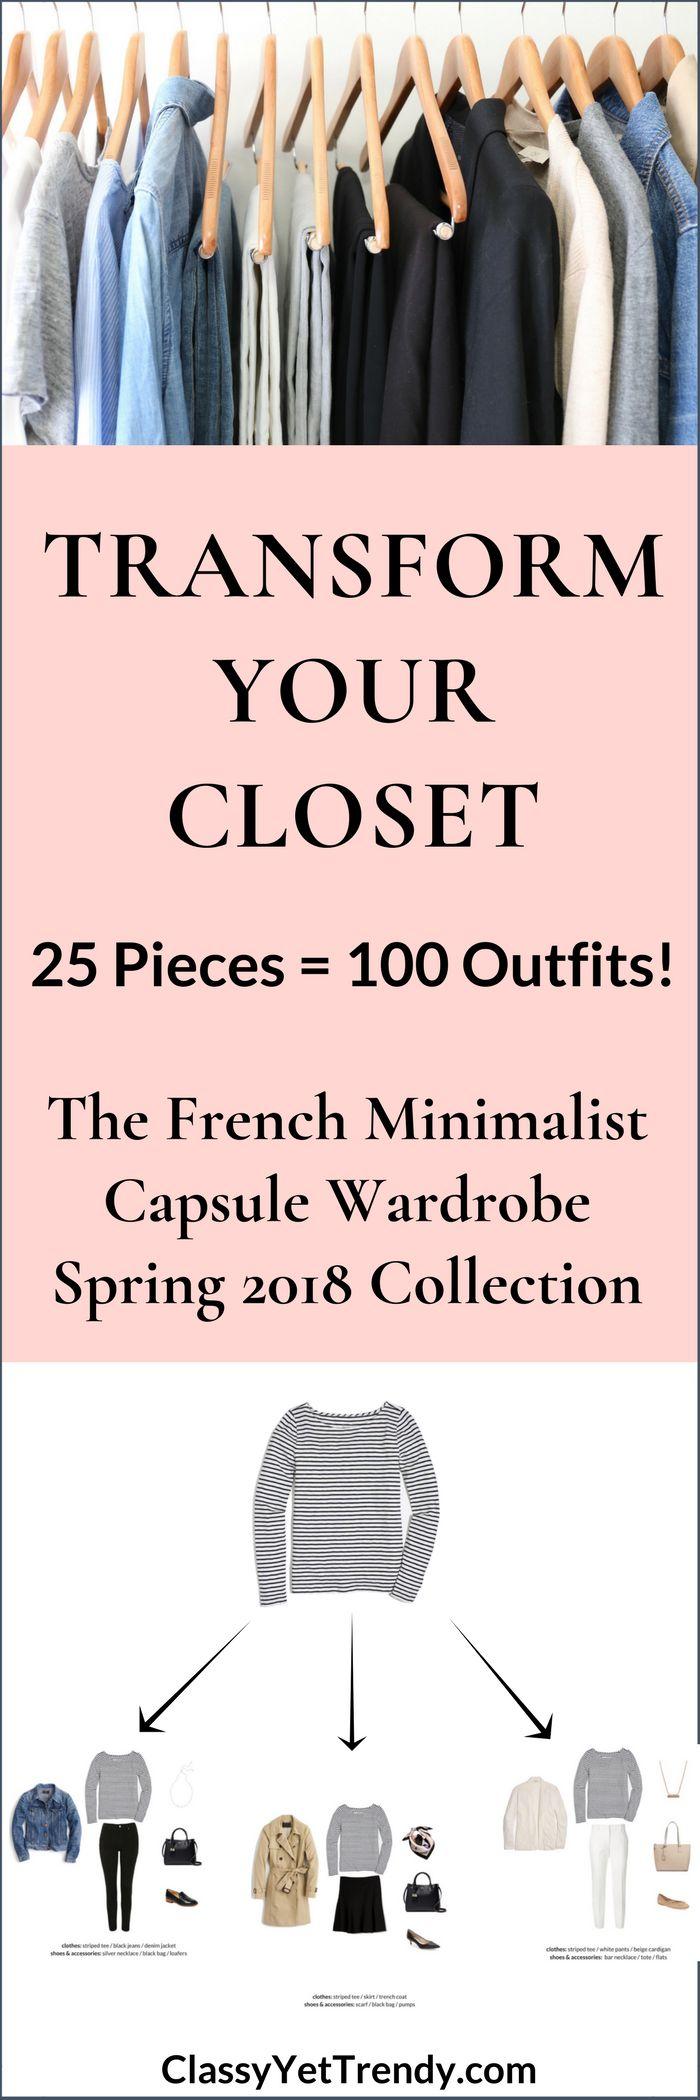 The French Minimalist Capsule Wardrobe: Spring 2018